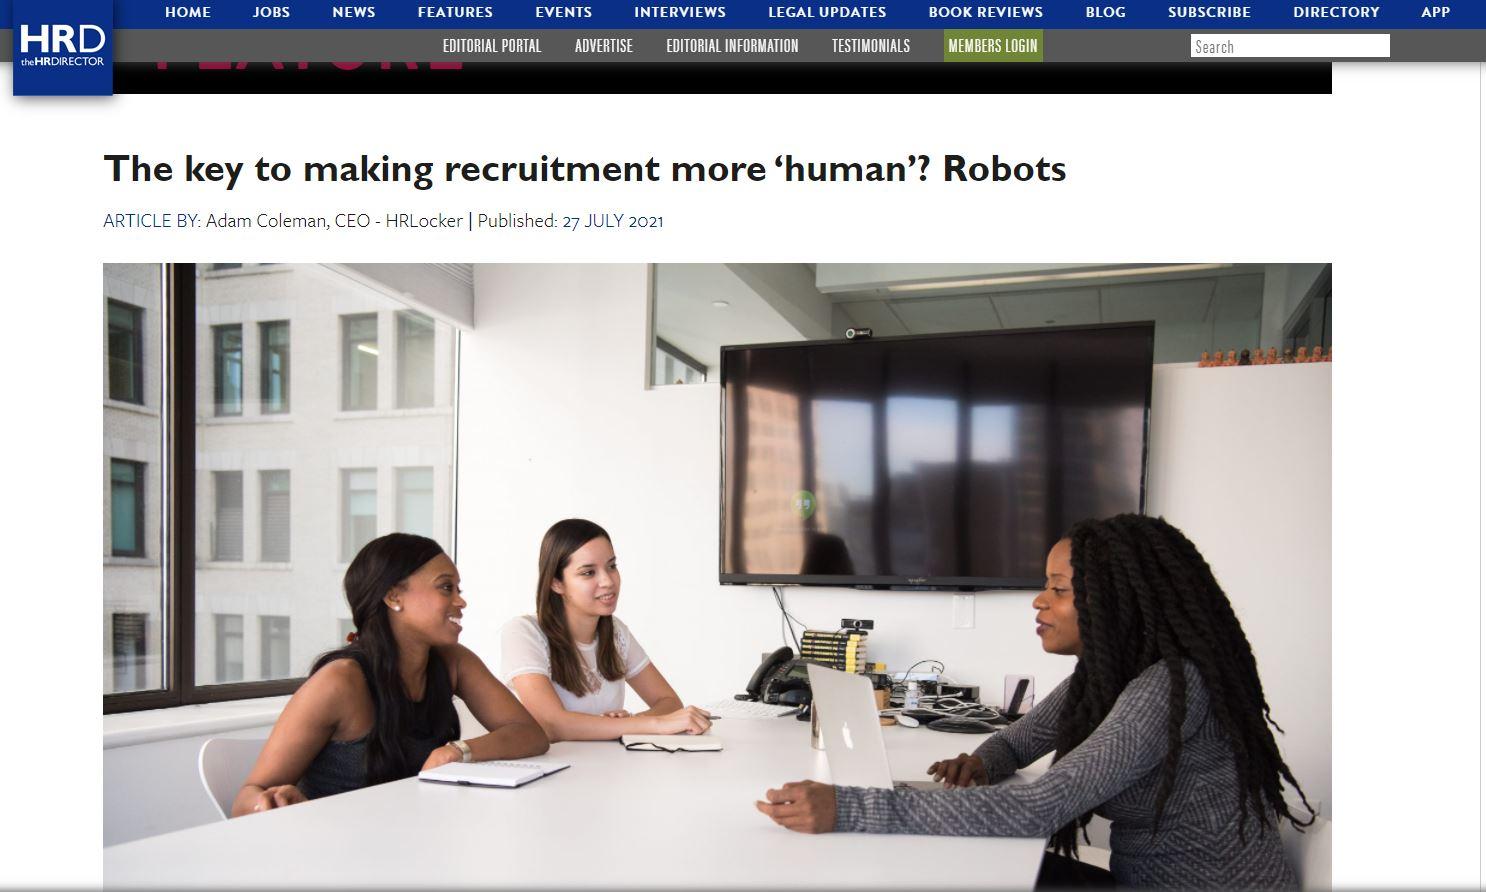 The key to making recruitment more 'human'?